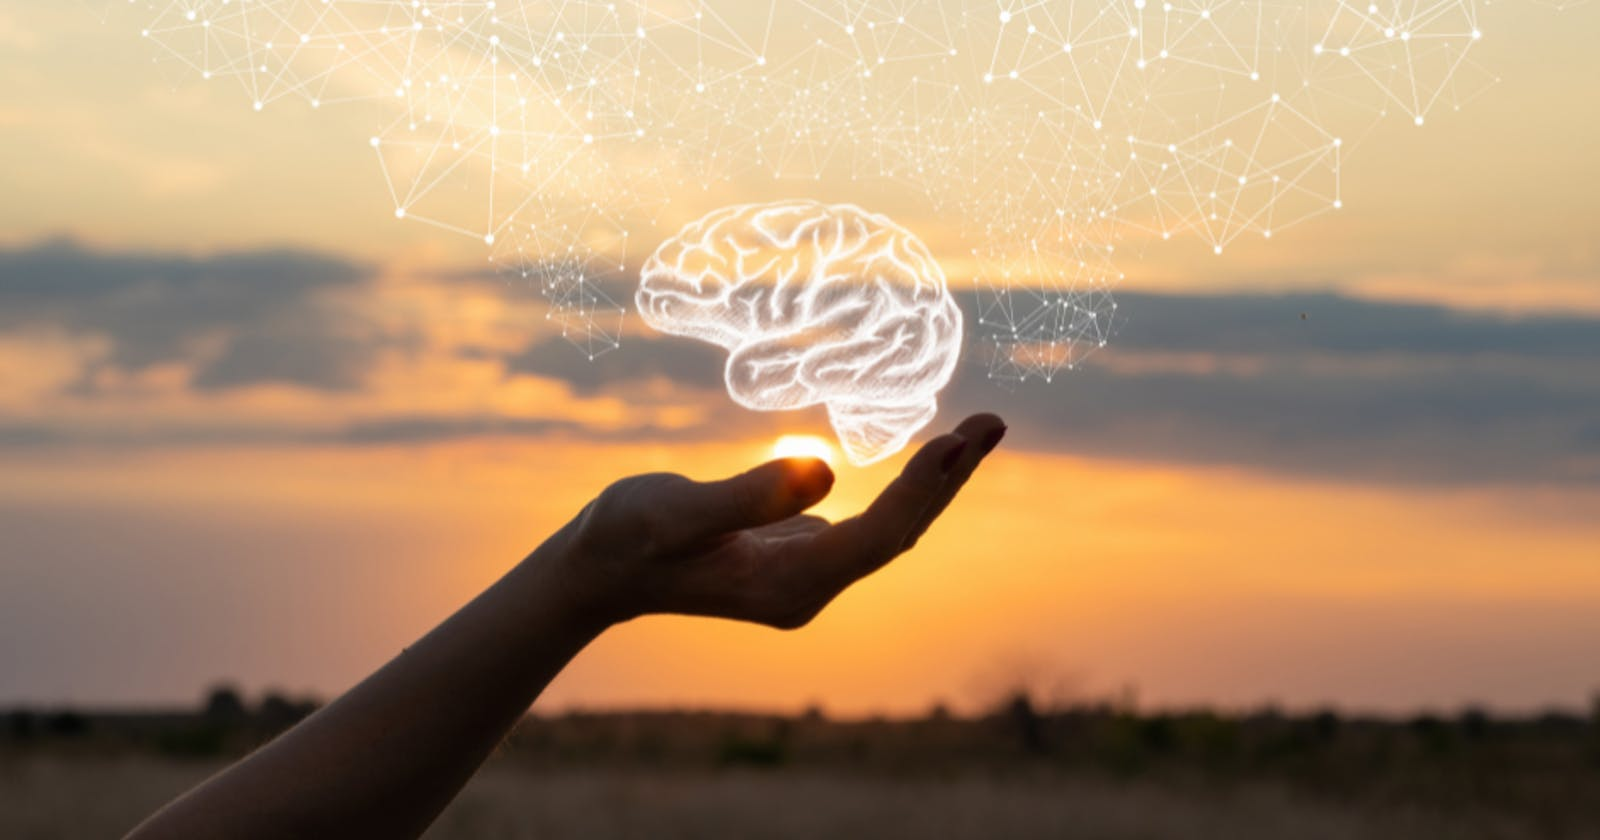 Finding your Brain Trust as a Tech Newbie